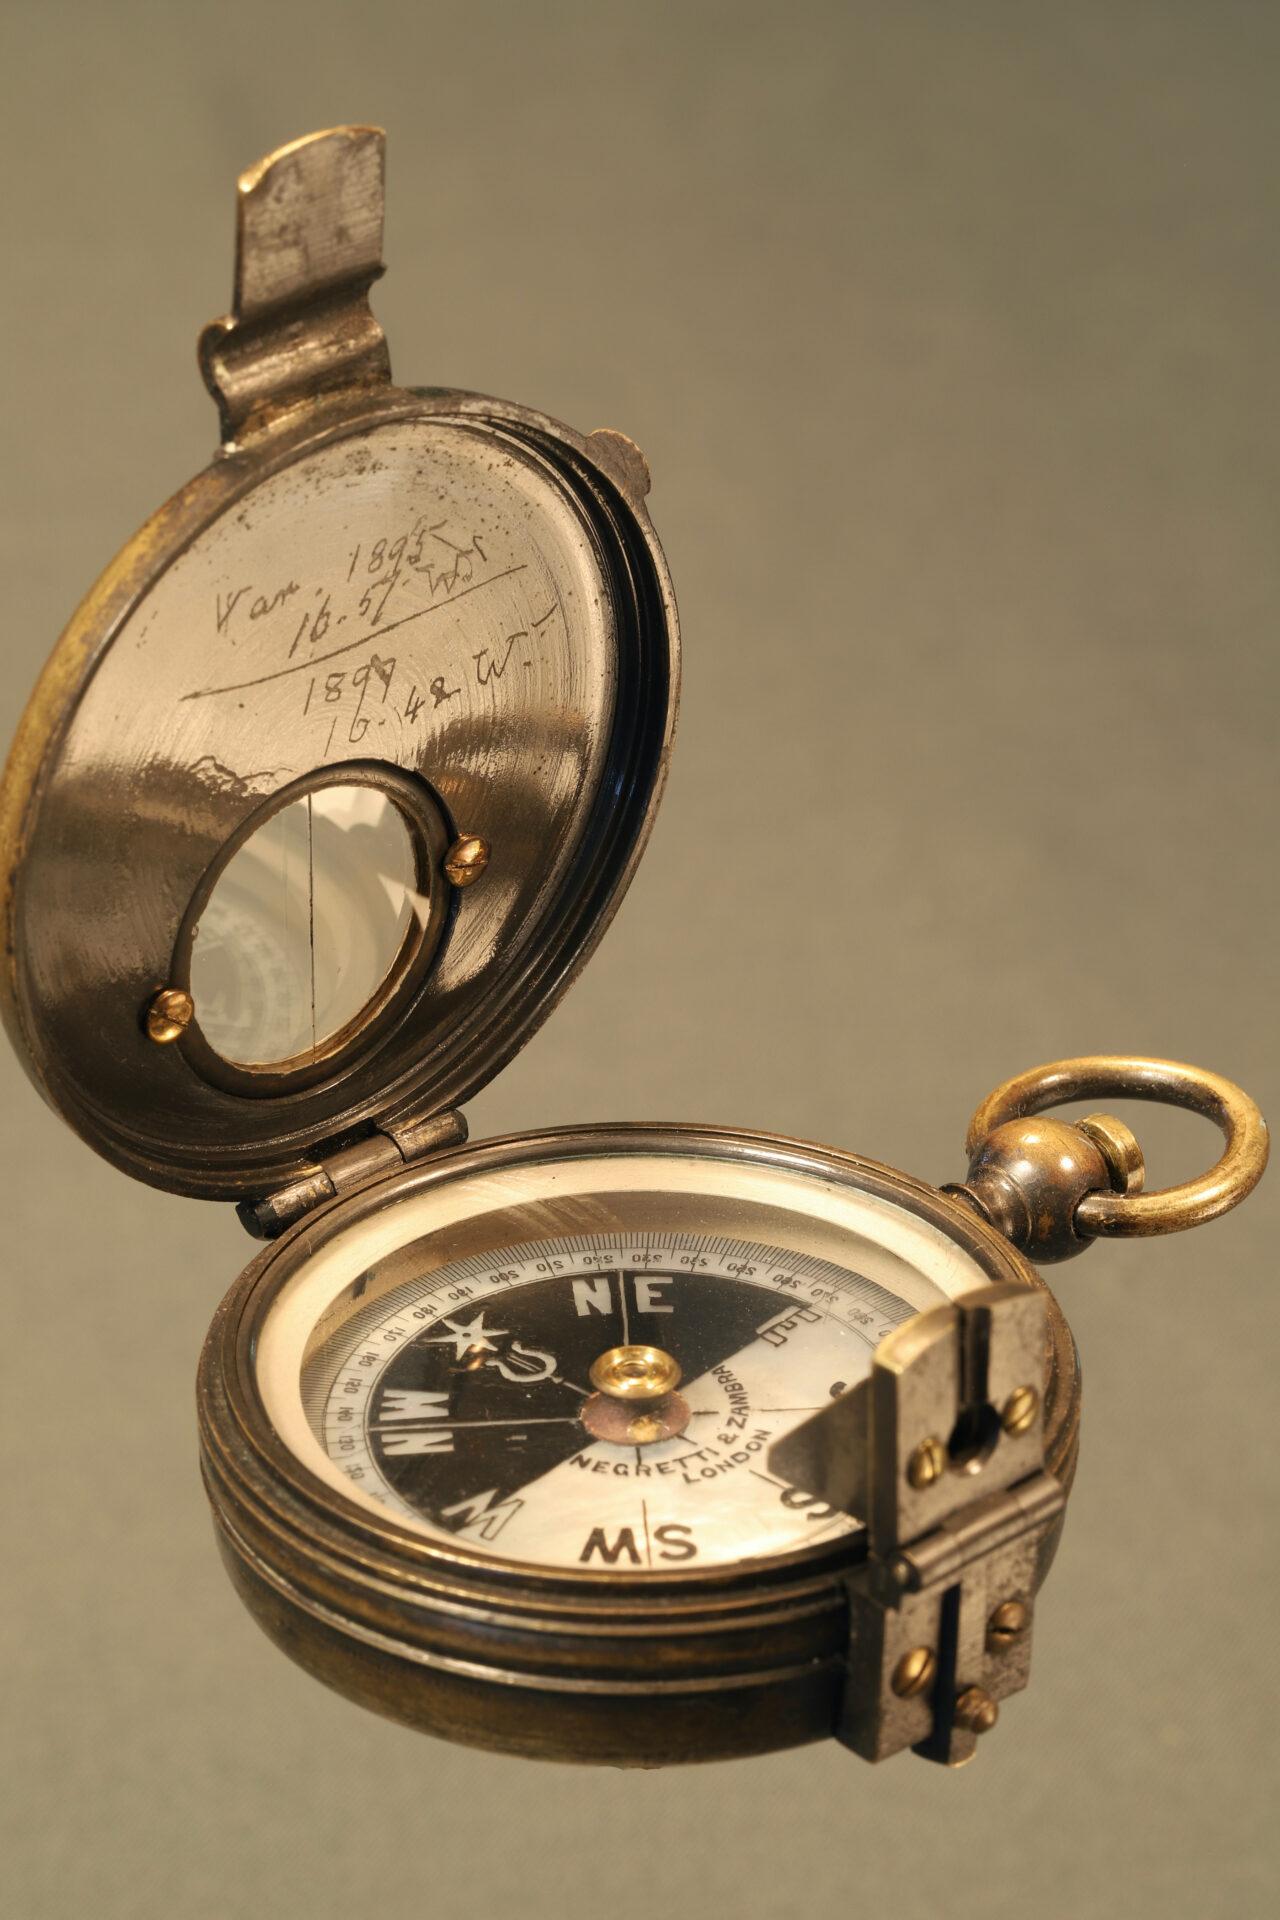 Image of open Negretti & Zambra Prismatic Compass c1895 taken from lefthand side